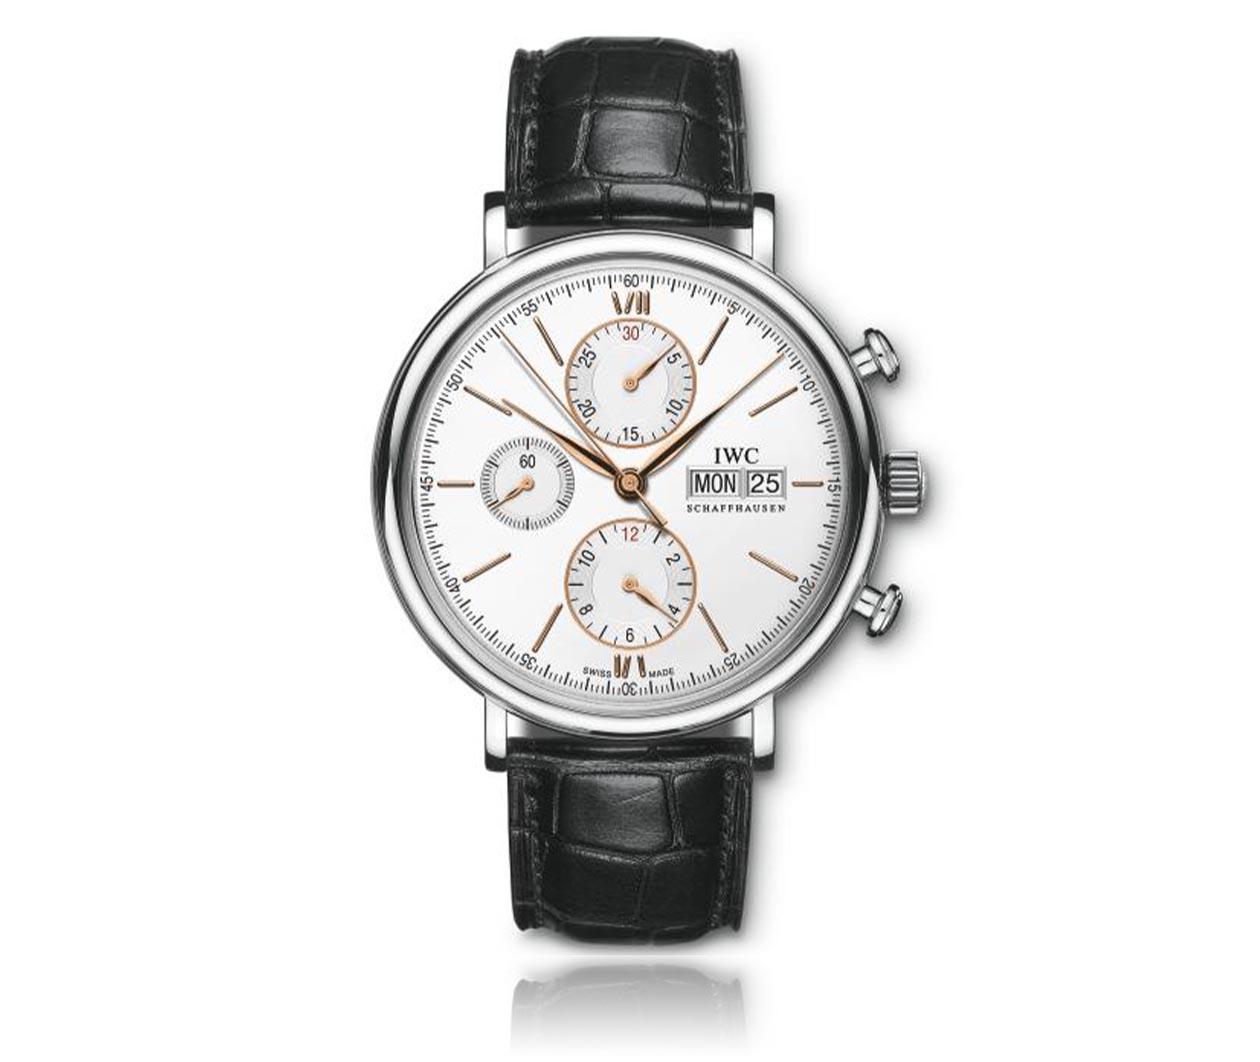 IWC Portofino Chronograph IW391031 Carousel 1 FINAL